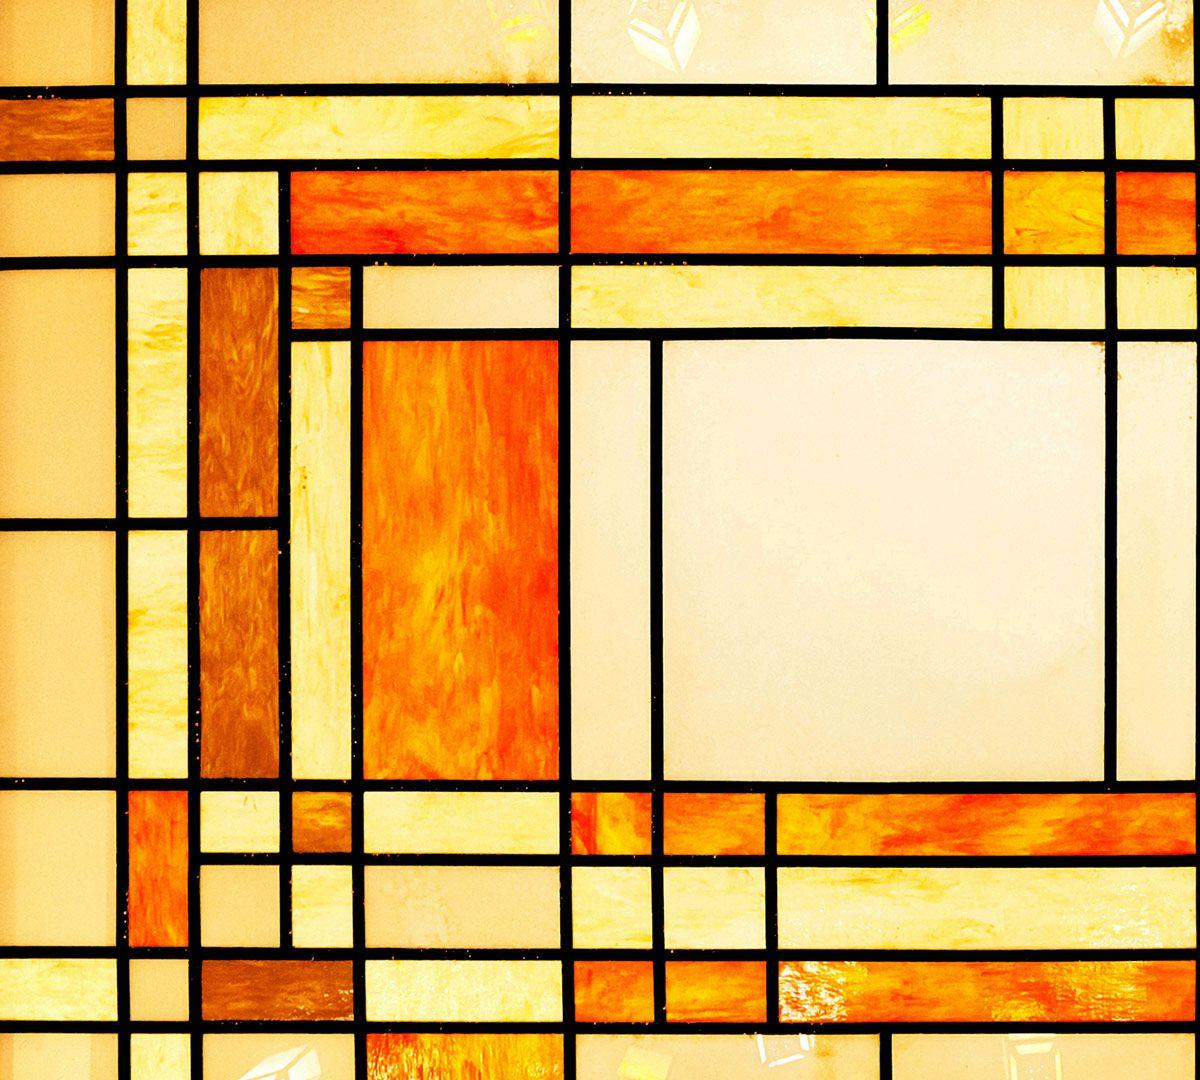 Vitral Adesivos Para Vidros Portas Janelas Ref M9